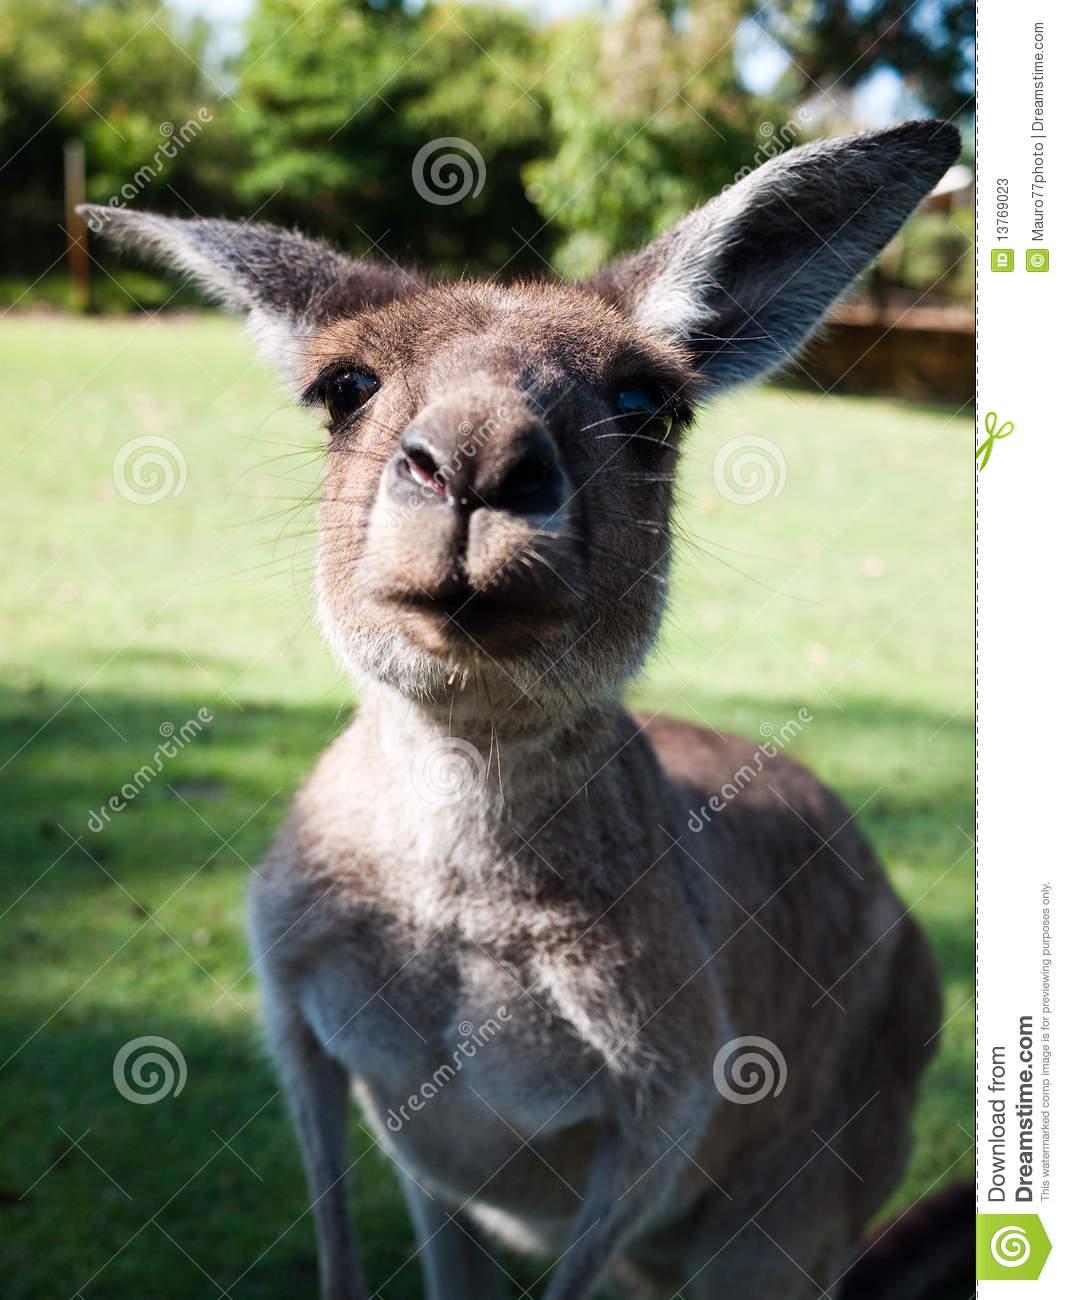 funny-kangaroo-13769023[1].jpg